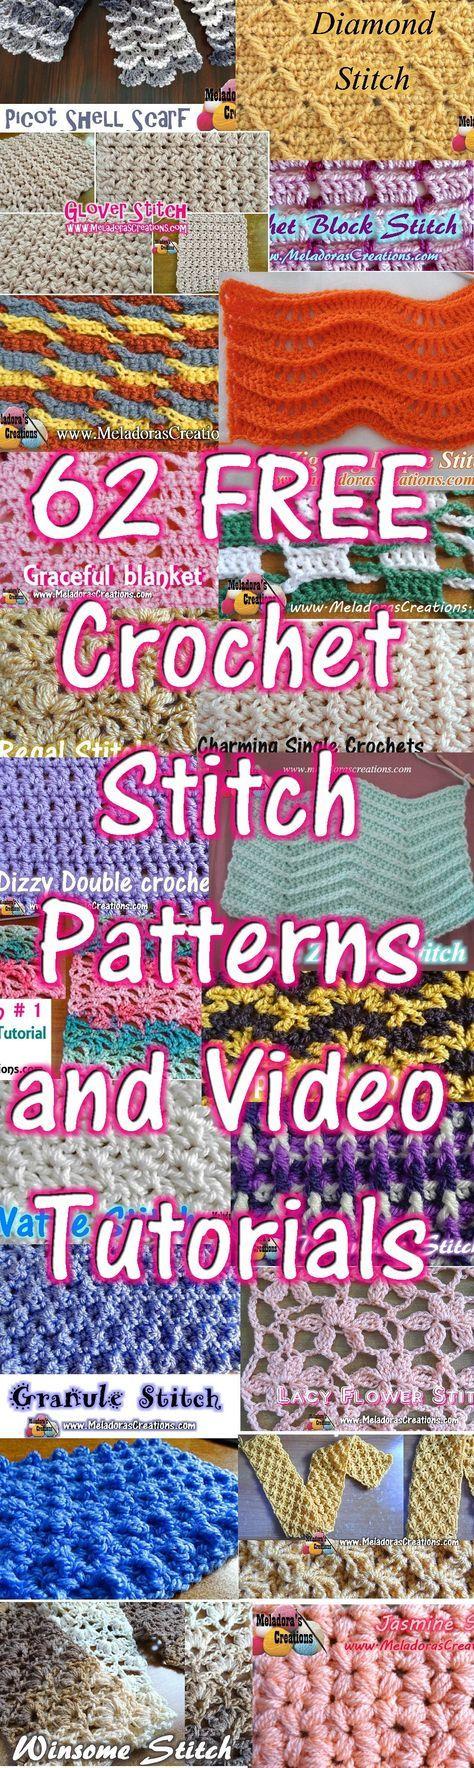 Crochet Stitch Patterns and Video | crochet | Pinterest | Ganchillo ...